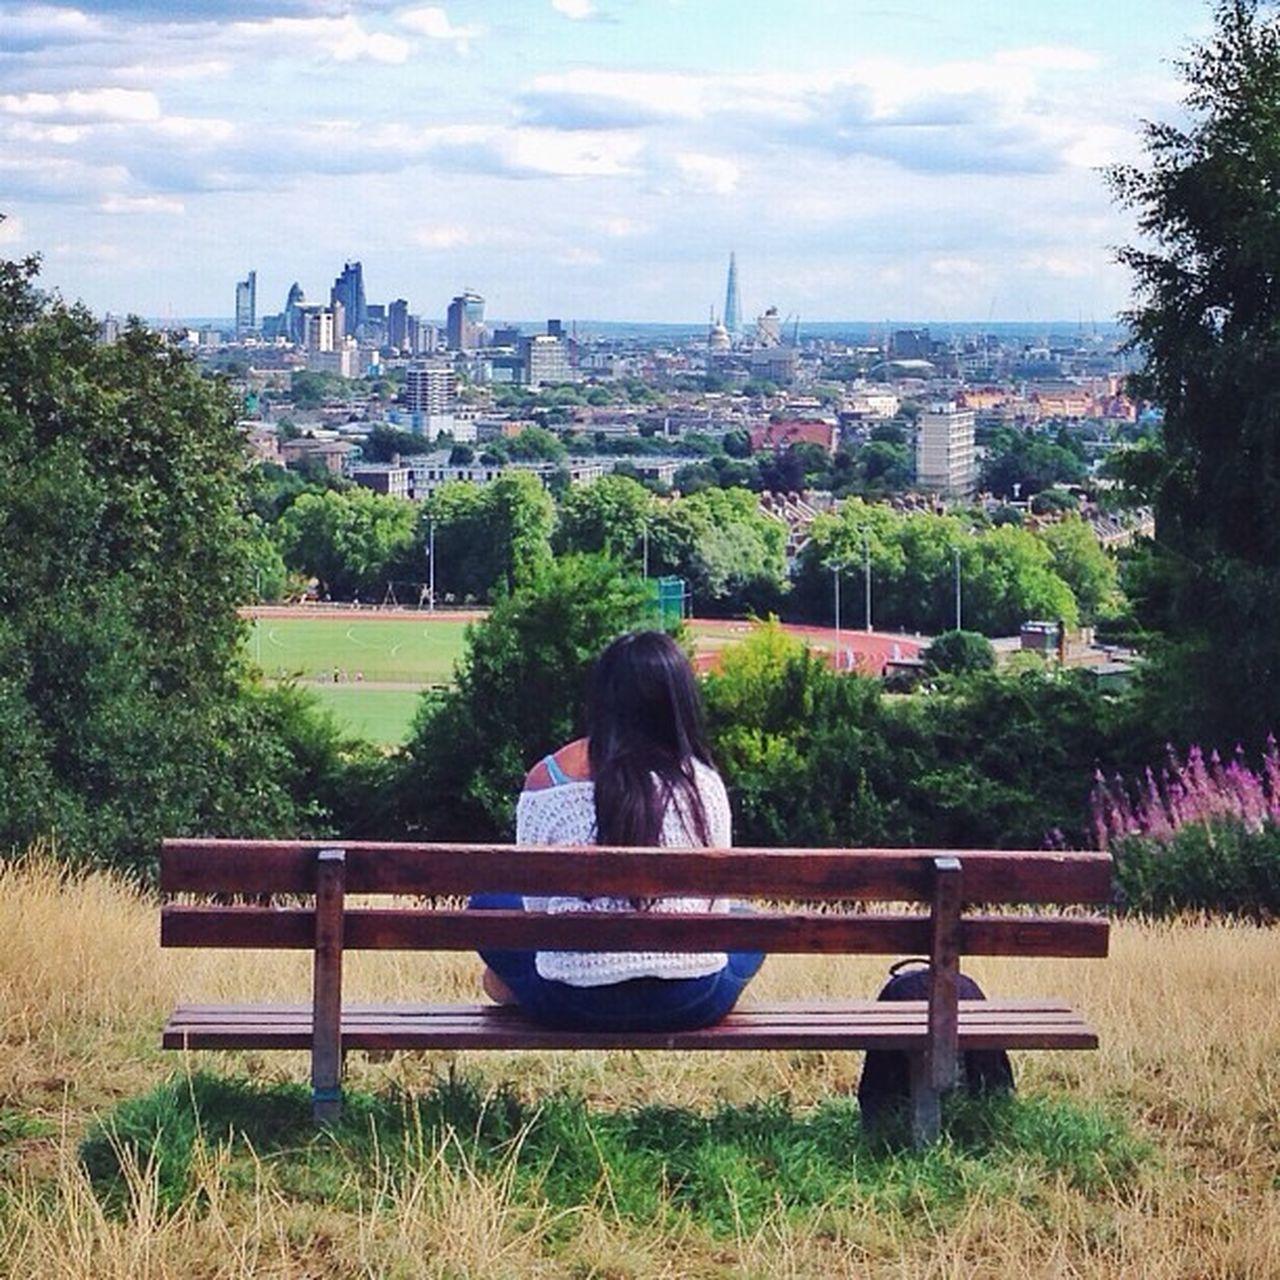 Sit down, relax and enjoy the view☀️?????☀️#alan_in_london #gf_uk #gang_family #igers_london #insta_london #london_only #thisislondon #from_city #ic_cities_london #ig_england #love_london #gi_uk #ig_london #londonpop #allshots_ #aauk #mashpics #pro_shoo Ig_london Aauk Gang_family Capture_today Londonpop Loveyoursummer Mashpics Allshots_ Top_masters London_only From_city Gf_uk Pro_shooters Alan_in_london Insta_london Thisislondon Gi_uk Igers_london Ig_england Love_london Ic_cities_london